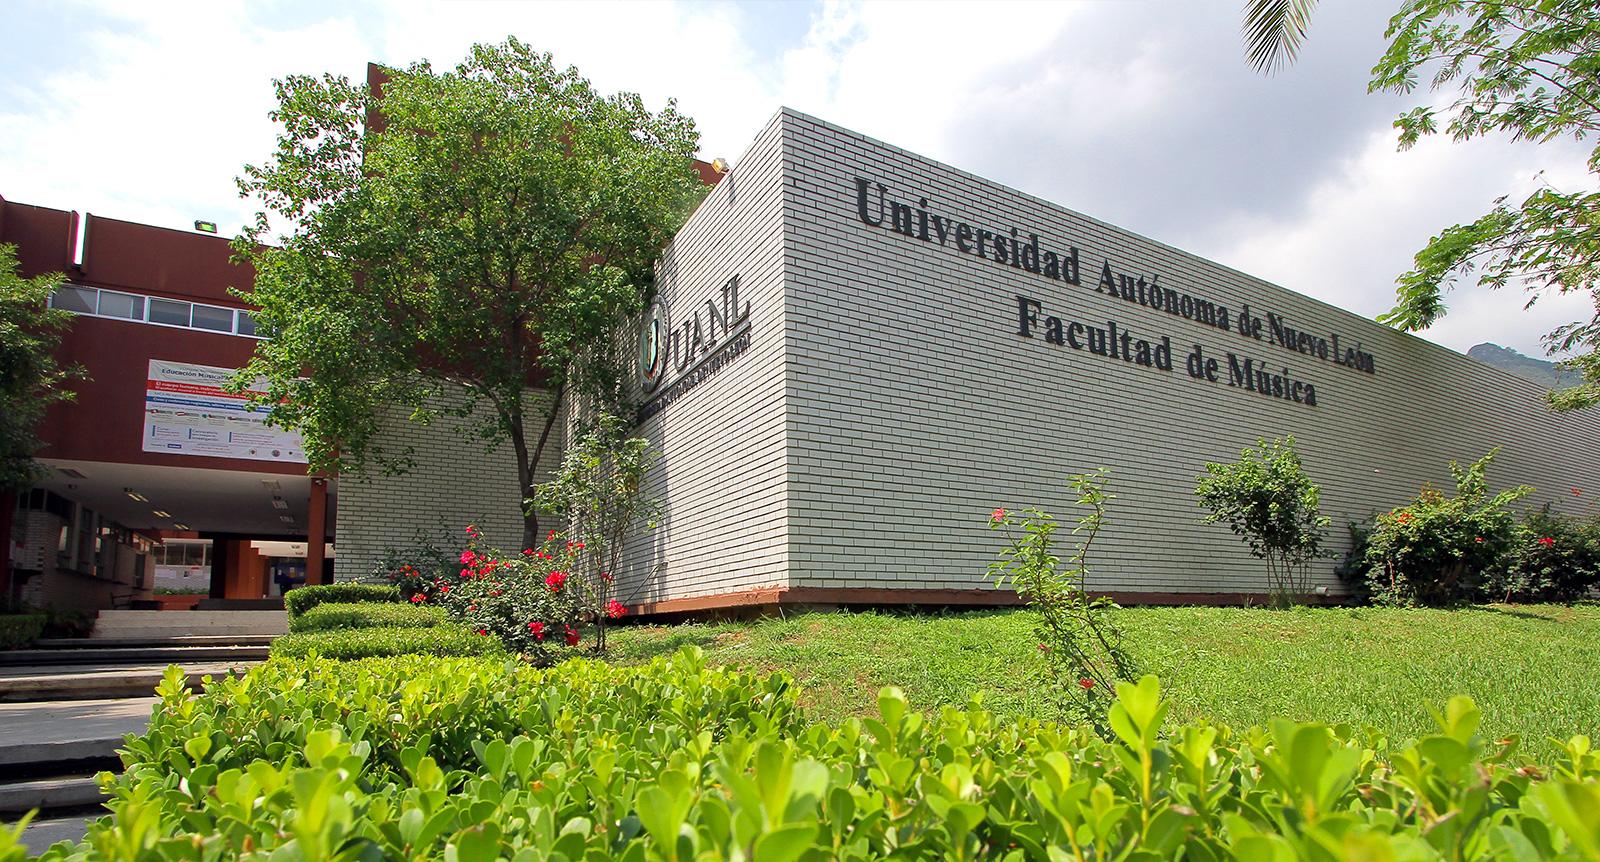 Facultad de Música